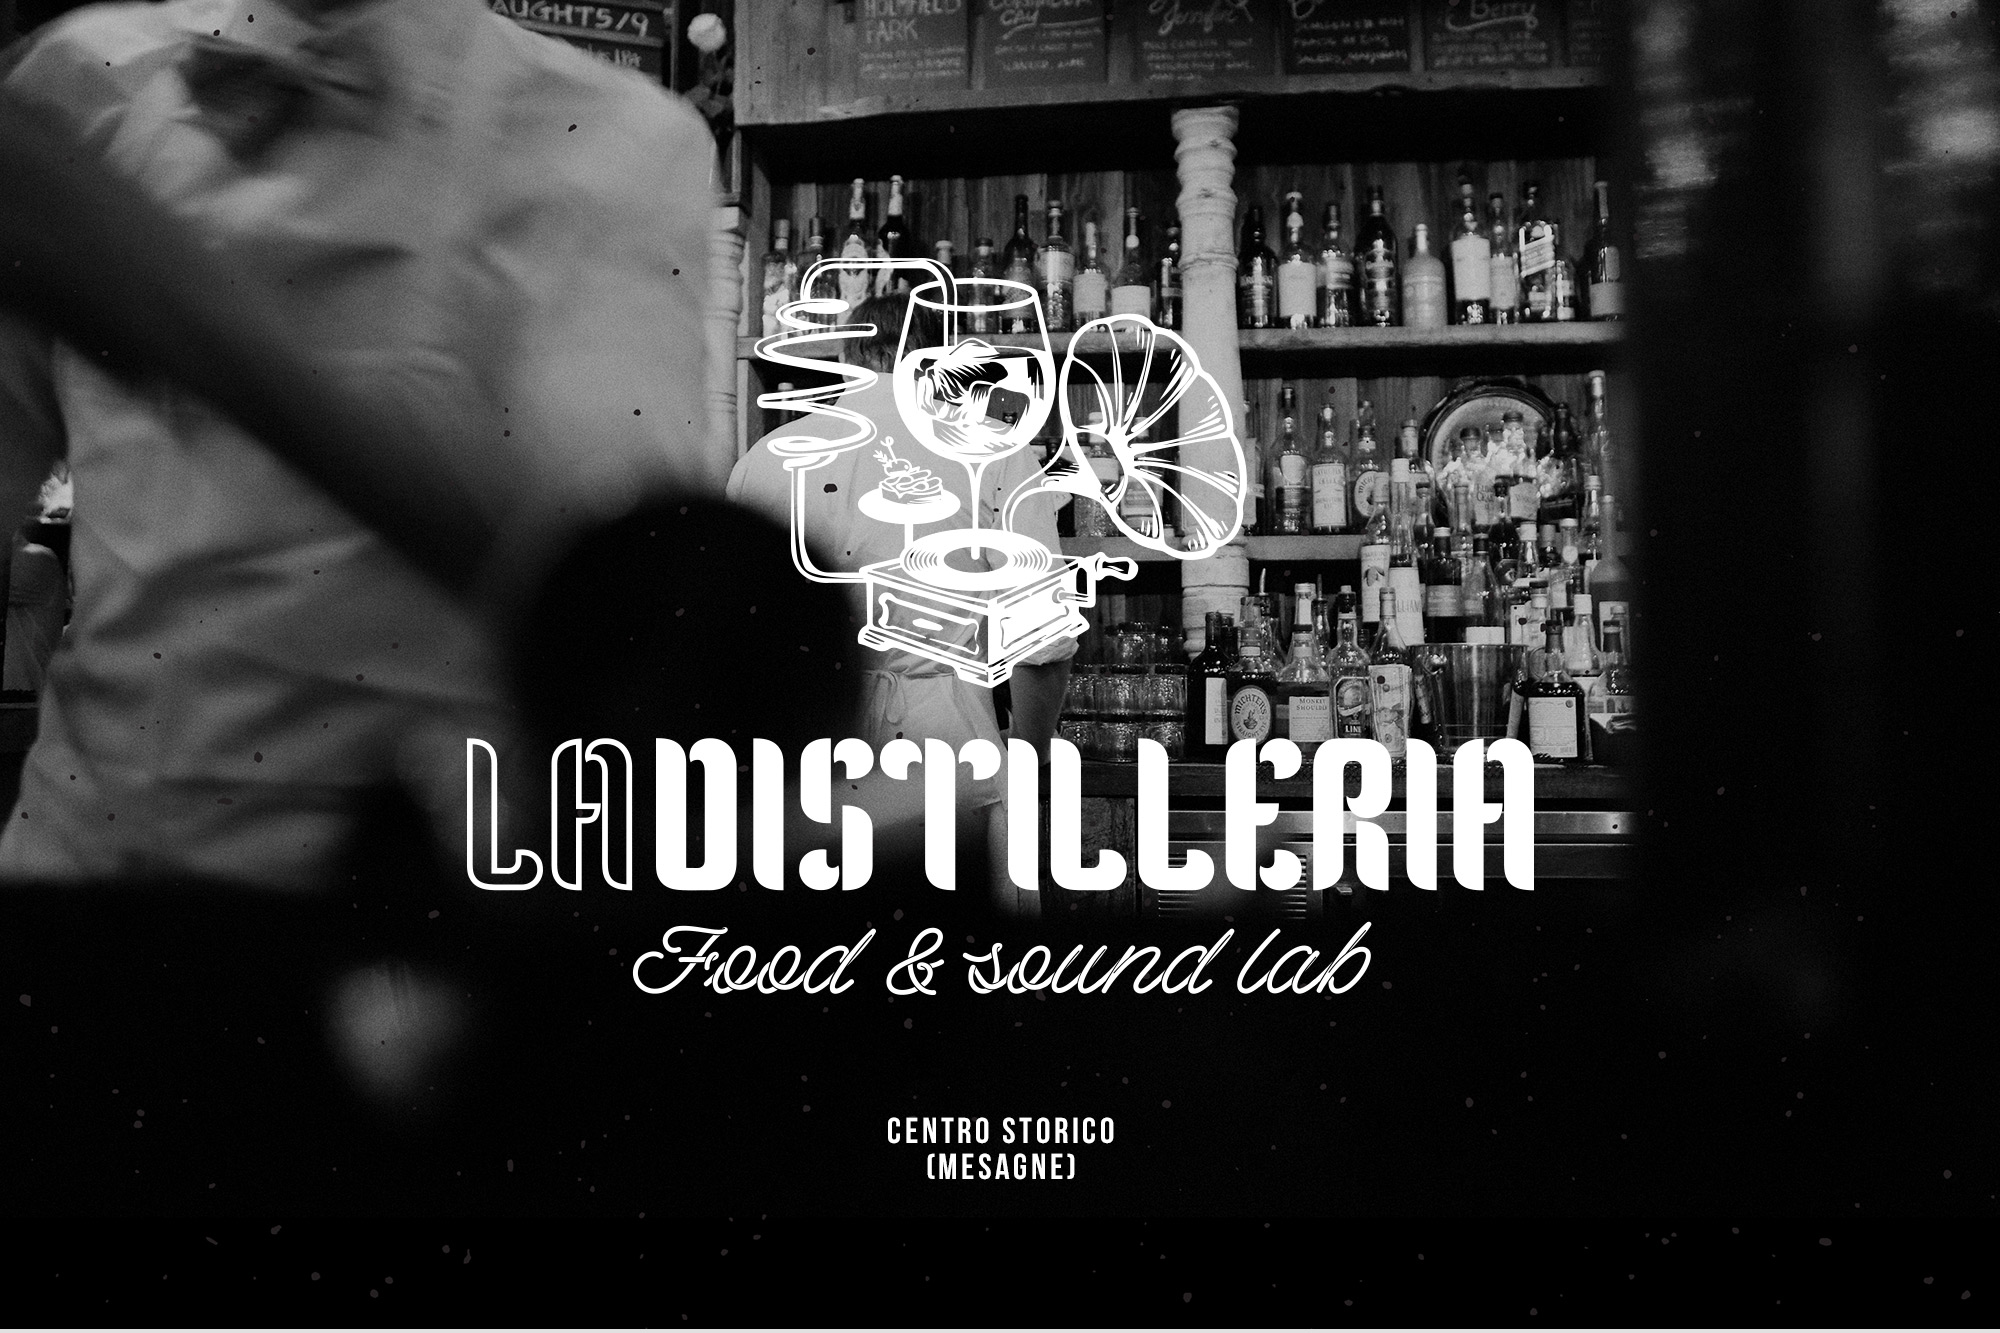 La Distilleria - Food & Sound Lab - logo, branding - img 2